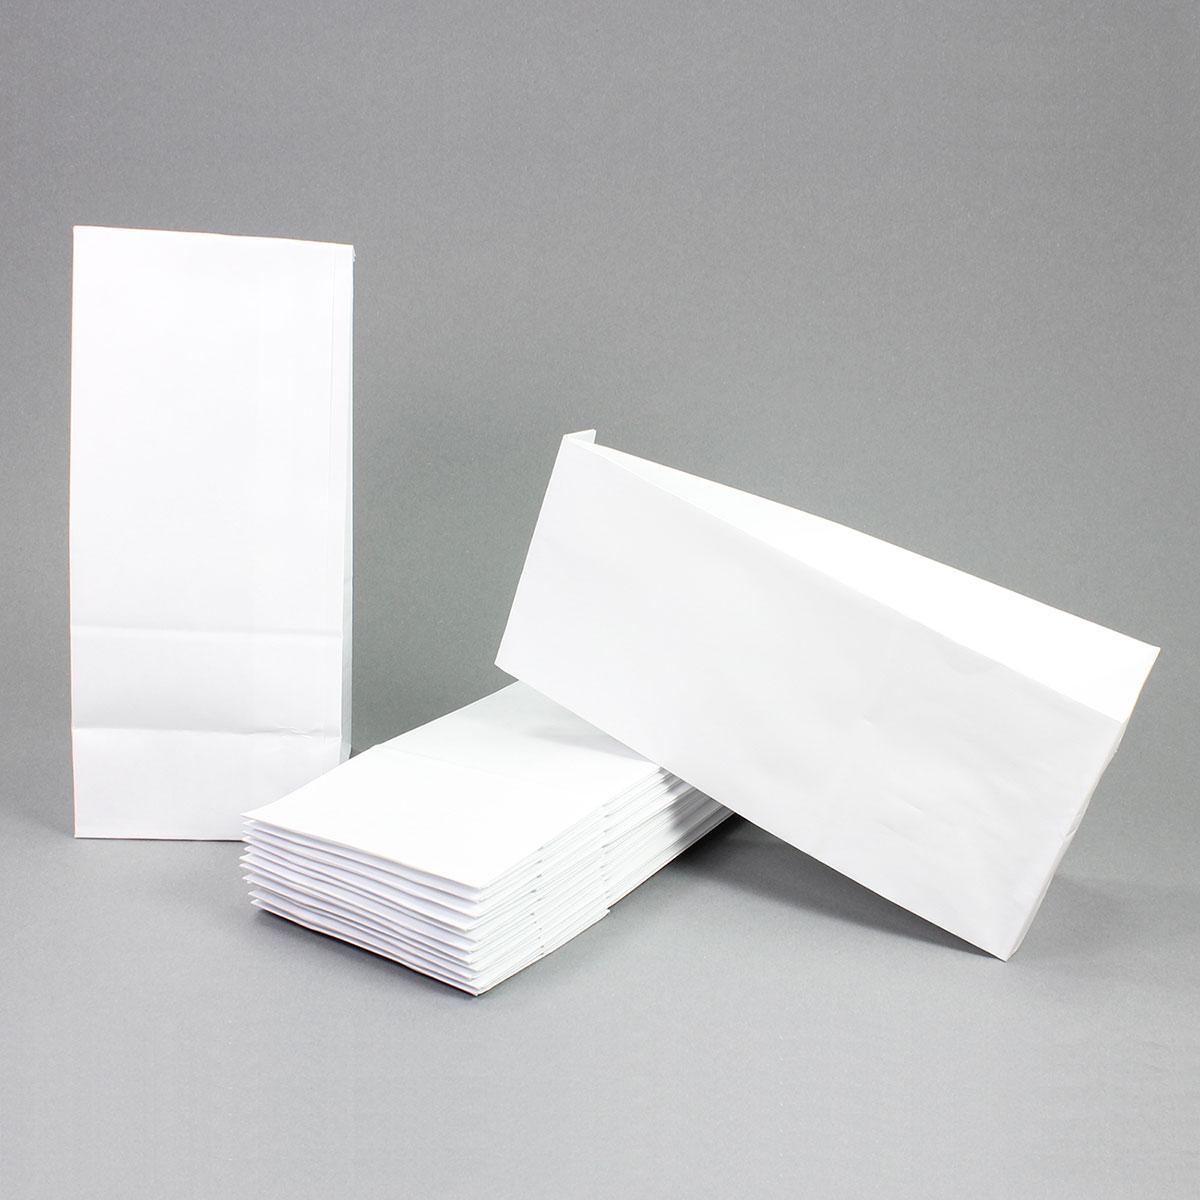 50 papiert ten wei in gr e 26x10x7 cm aus kraftpapier ideal zum bef llen f r adventskalender. Black Bedroom Furniture Sets. Home Design Ideas